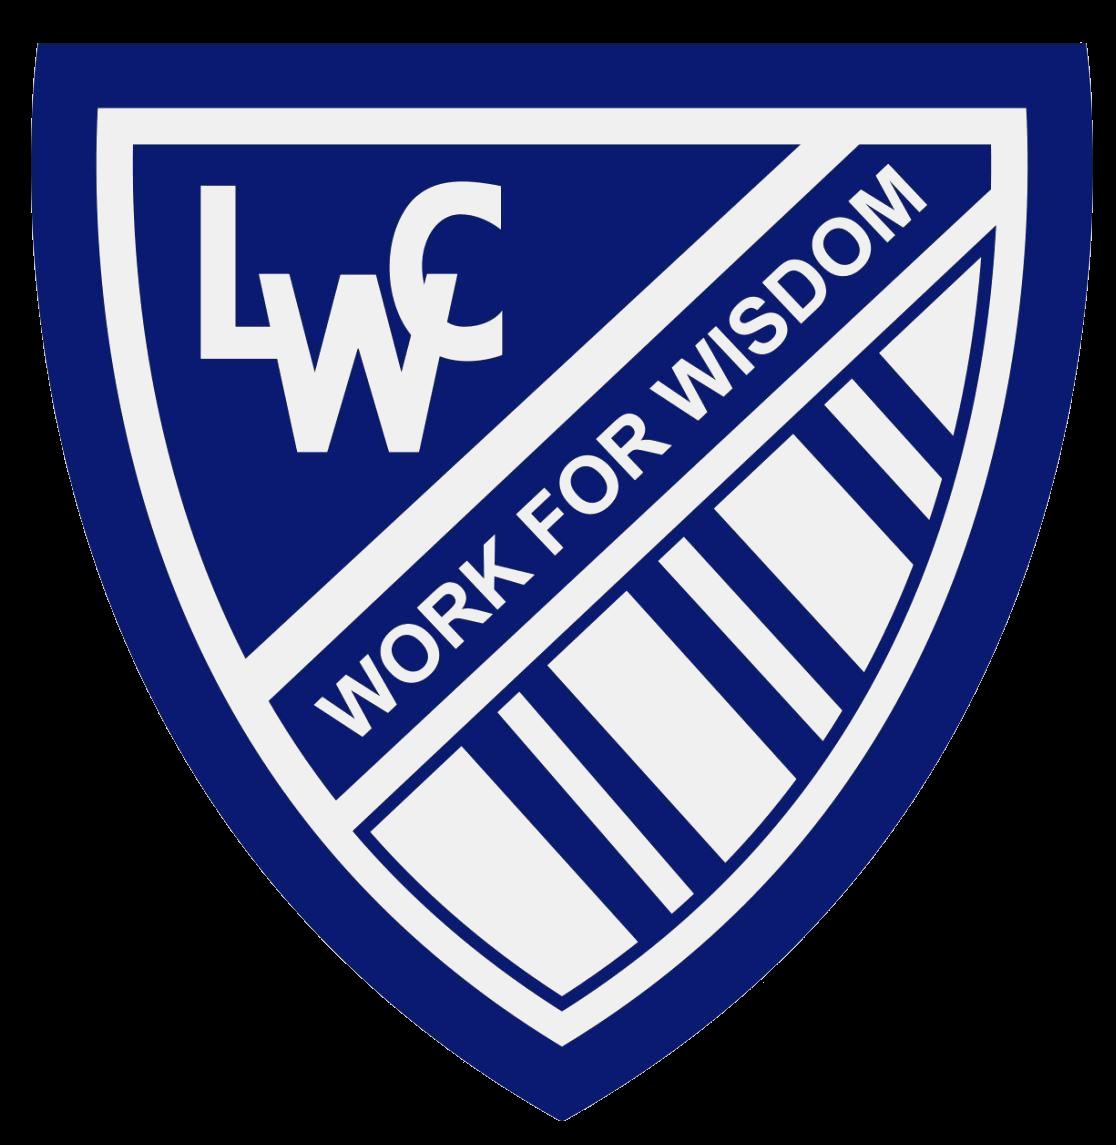 Lane Cove West logo